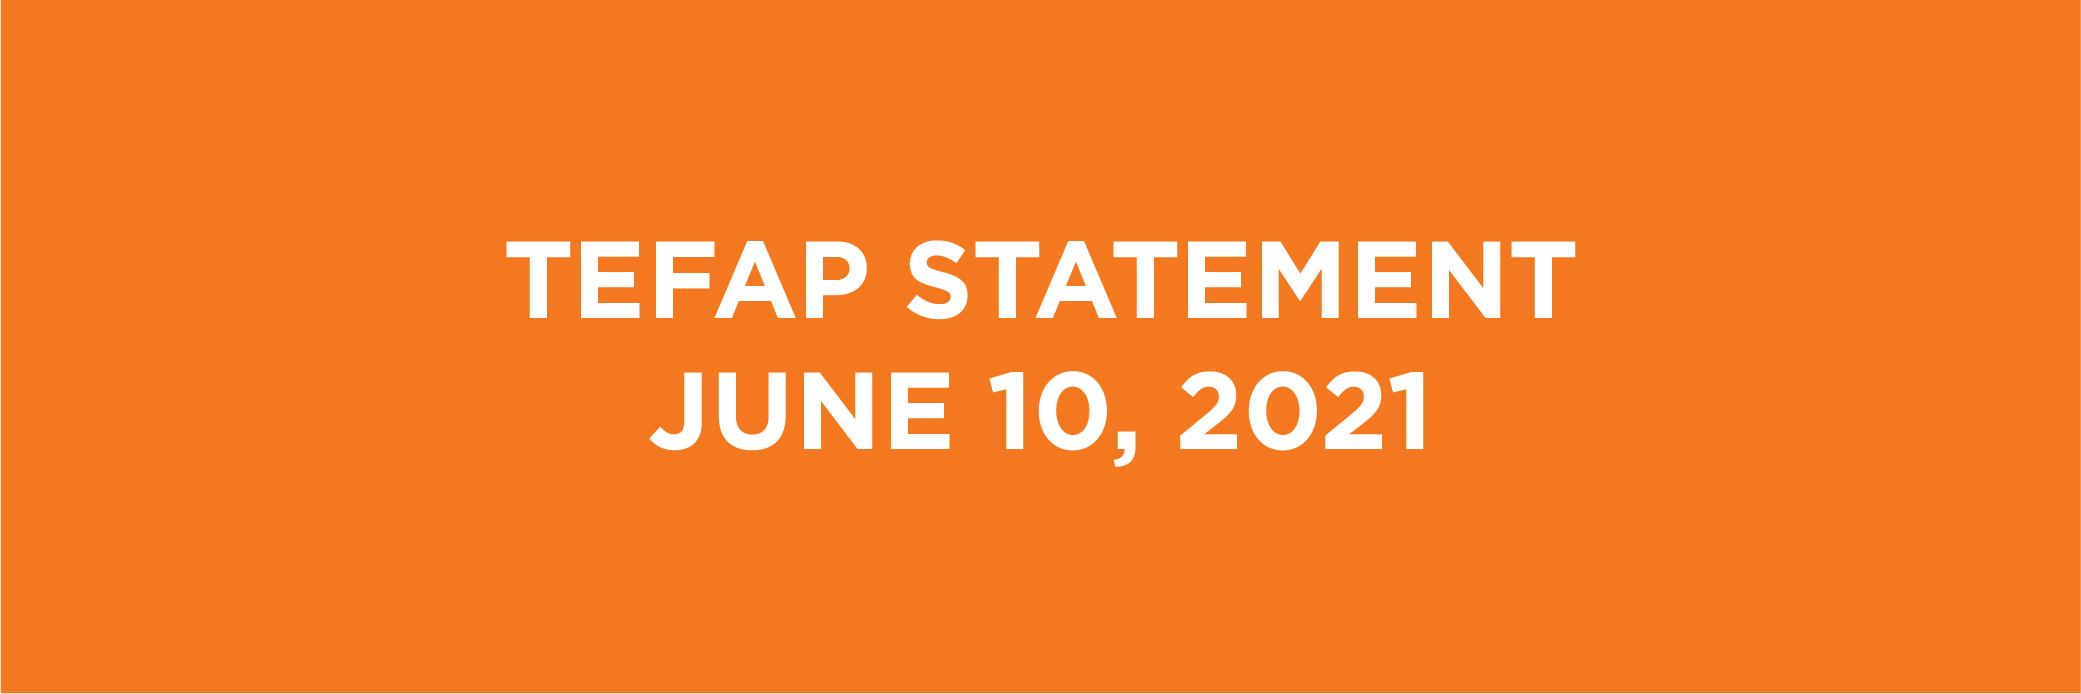 Feeding South Florida's TEFAP Statement – June 10, 2021